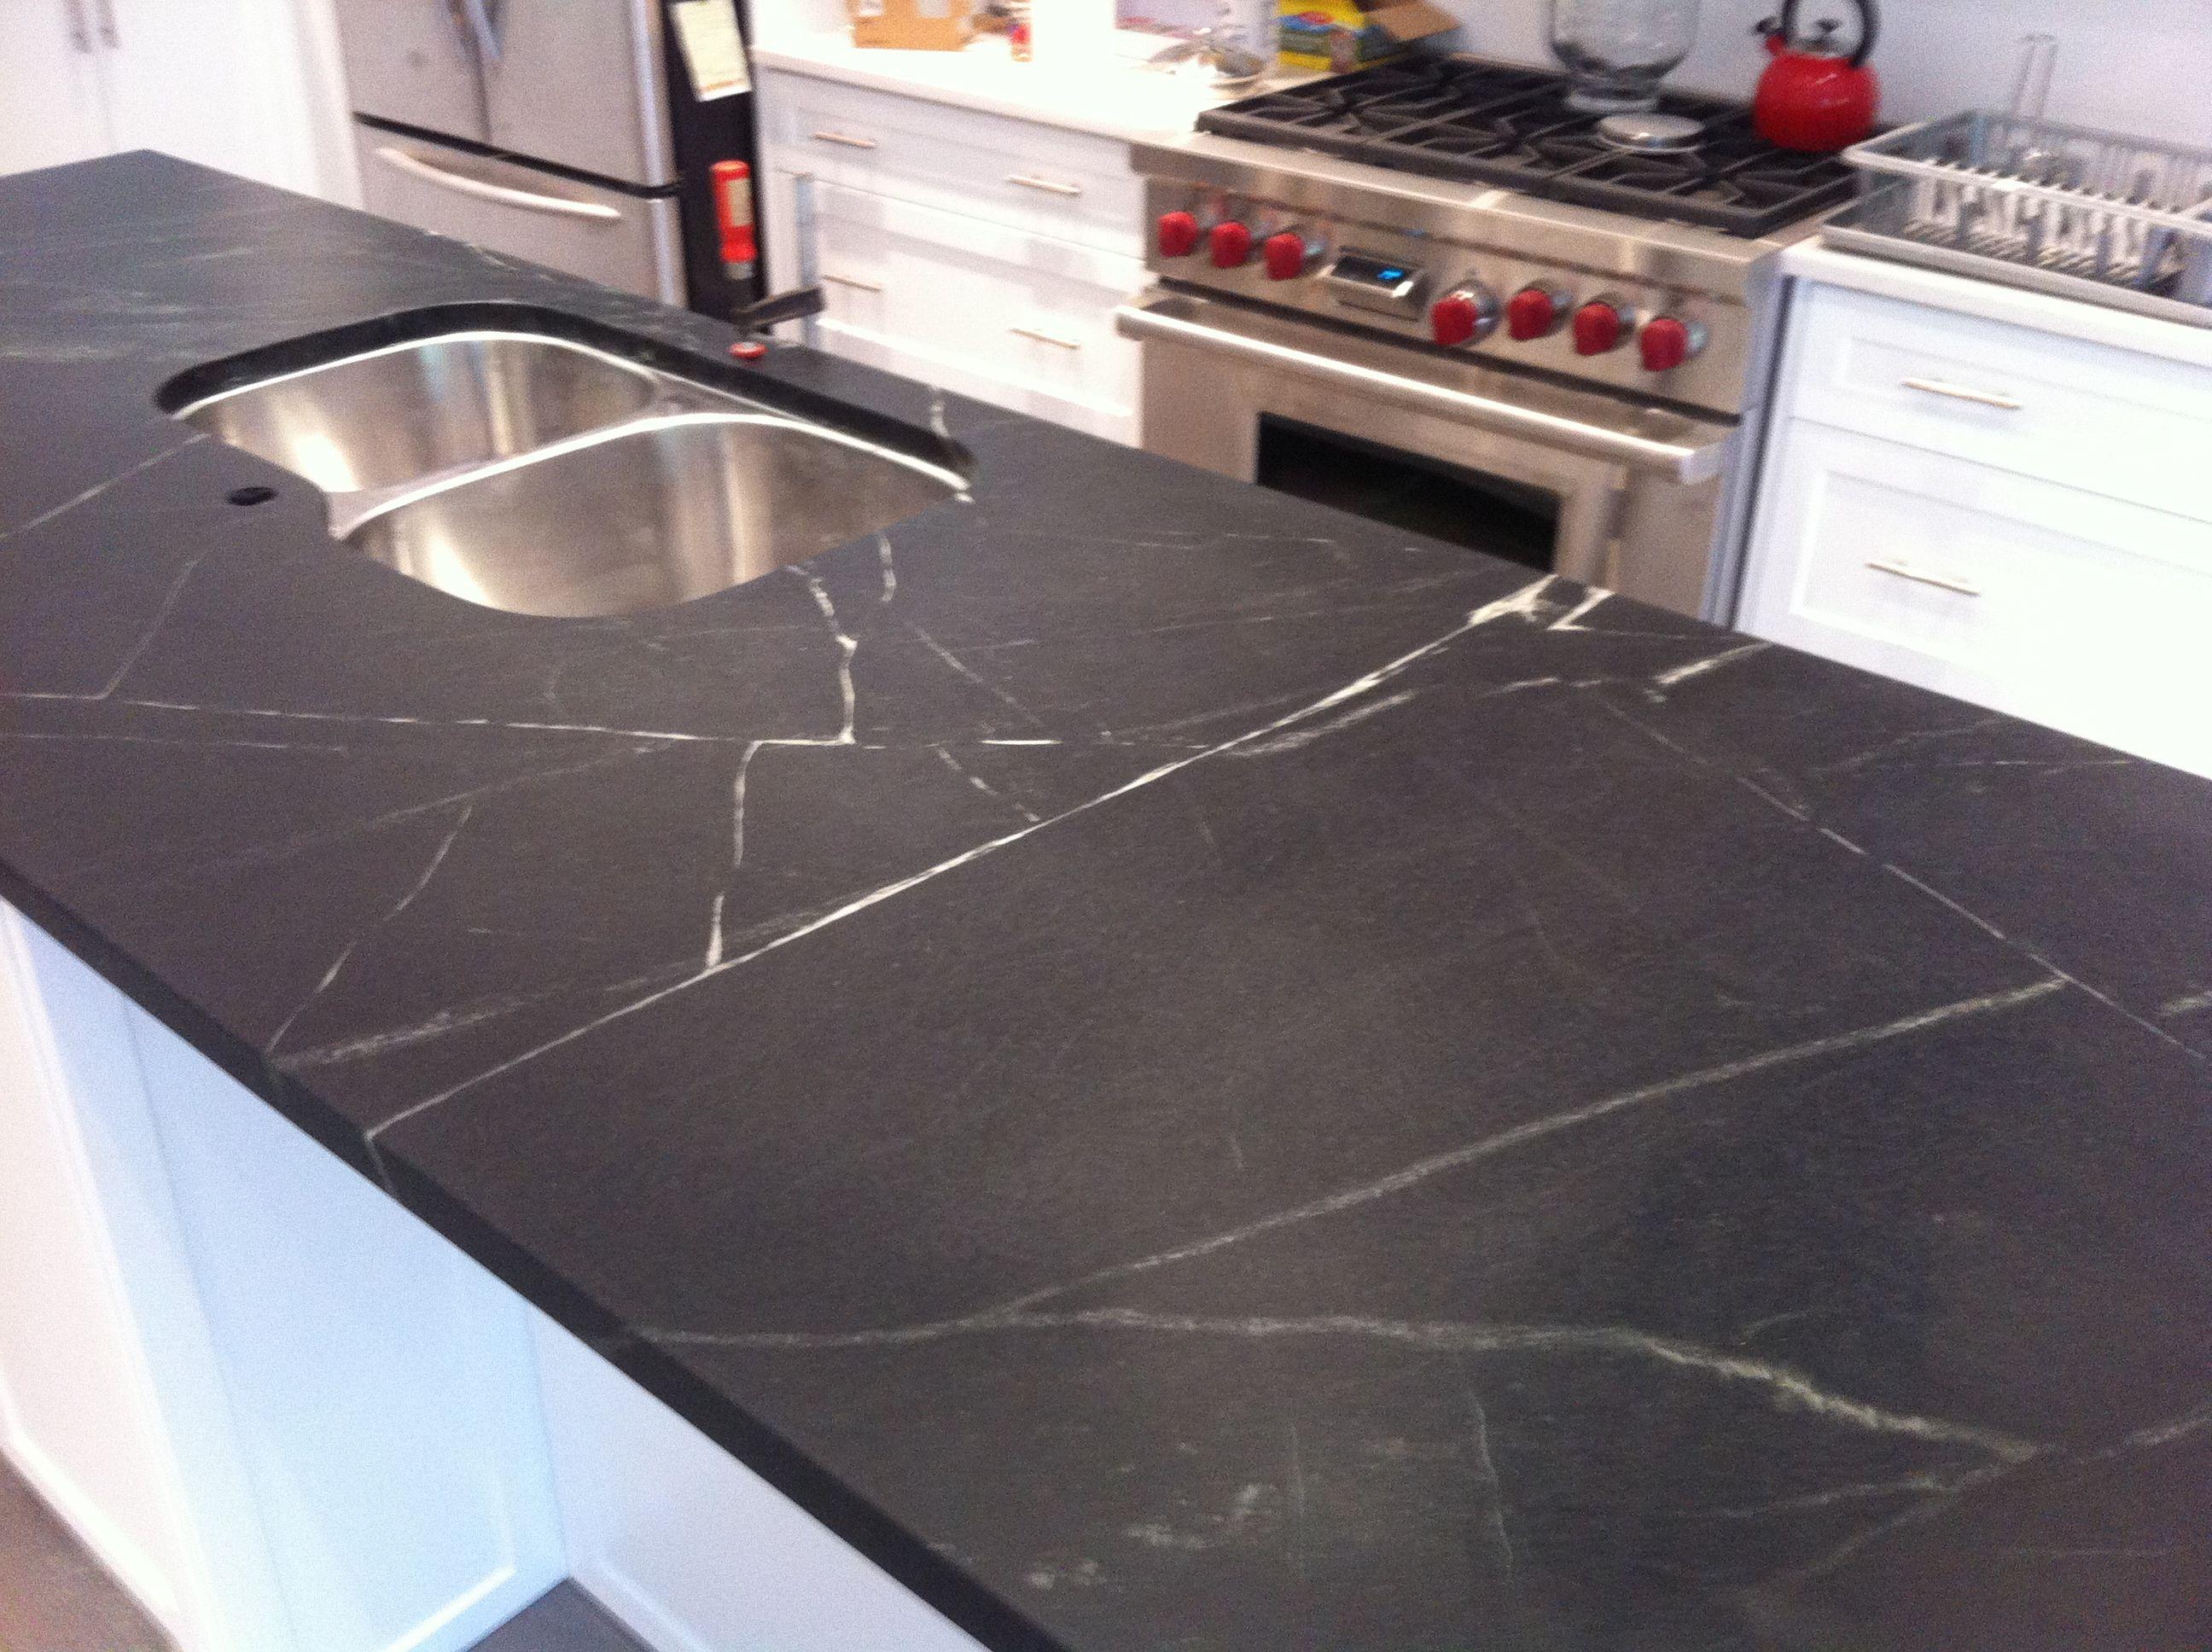 soapstone soapstone kitchen countertops Greensville Soapstone Company Barroca Soapstone Kitchen Island